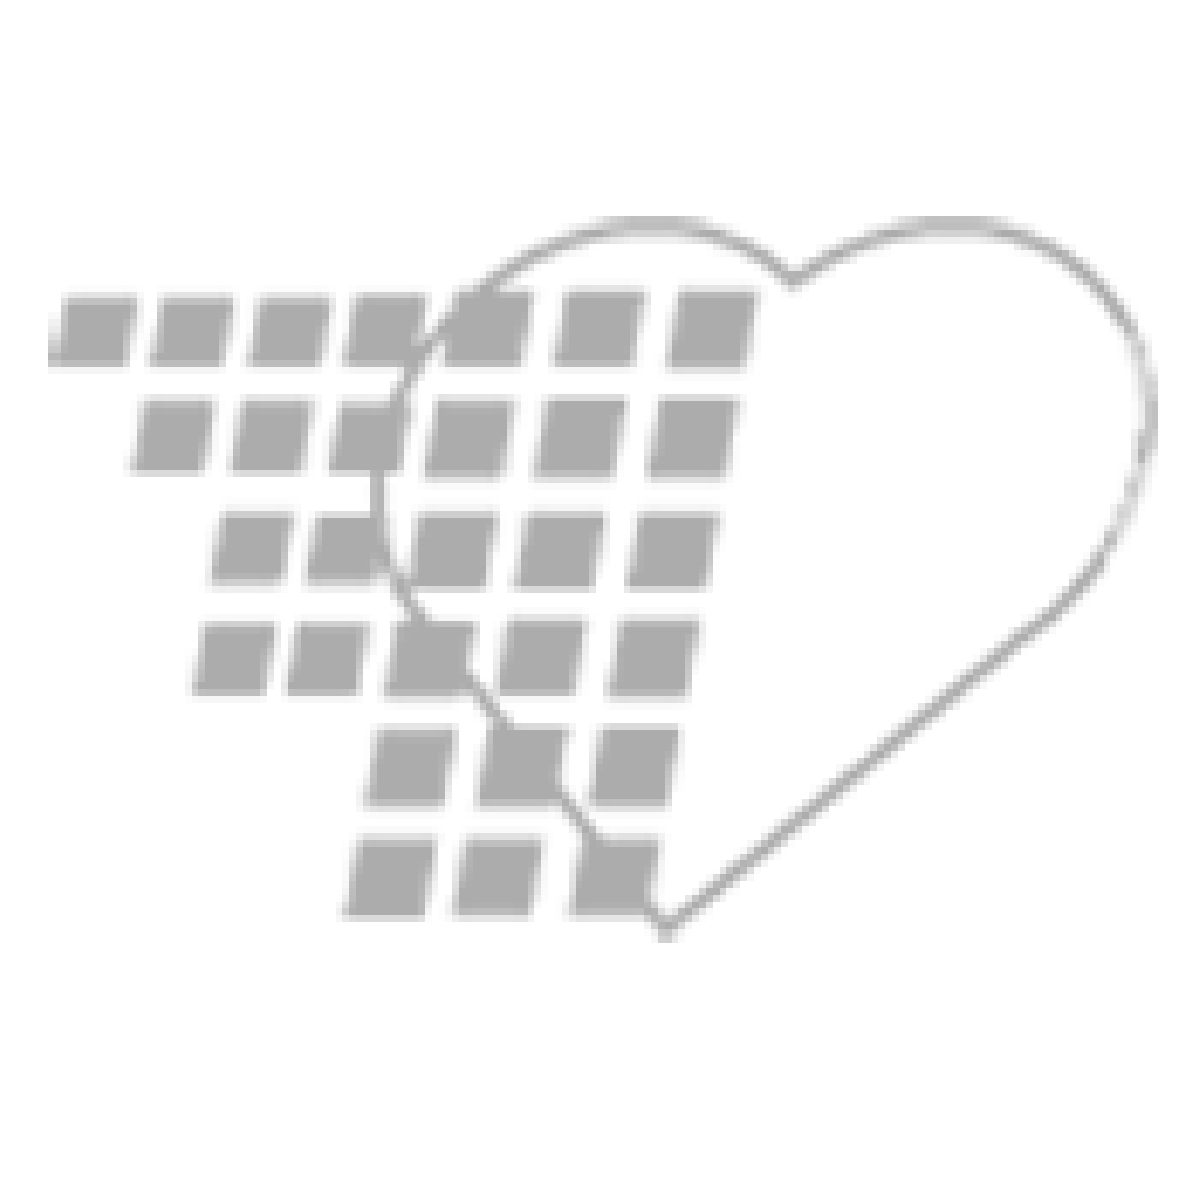 02-70-4001 ADC Laryngoscope Blade, Disposable Fiber Optic